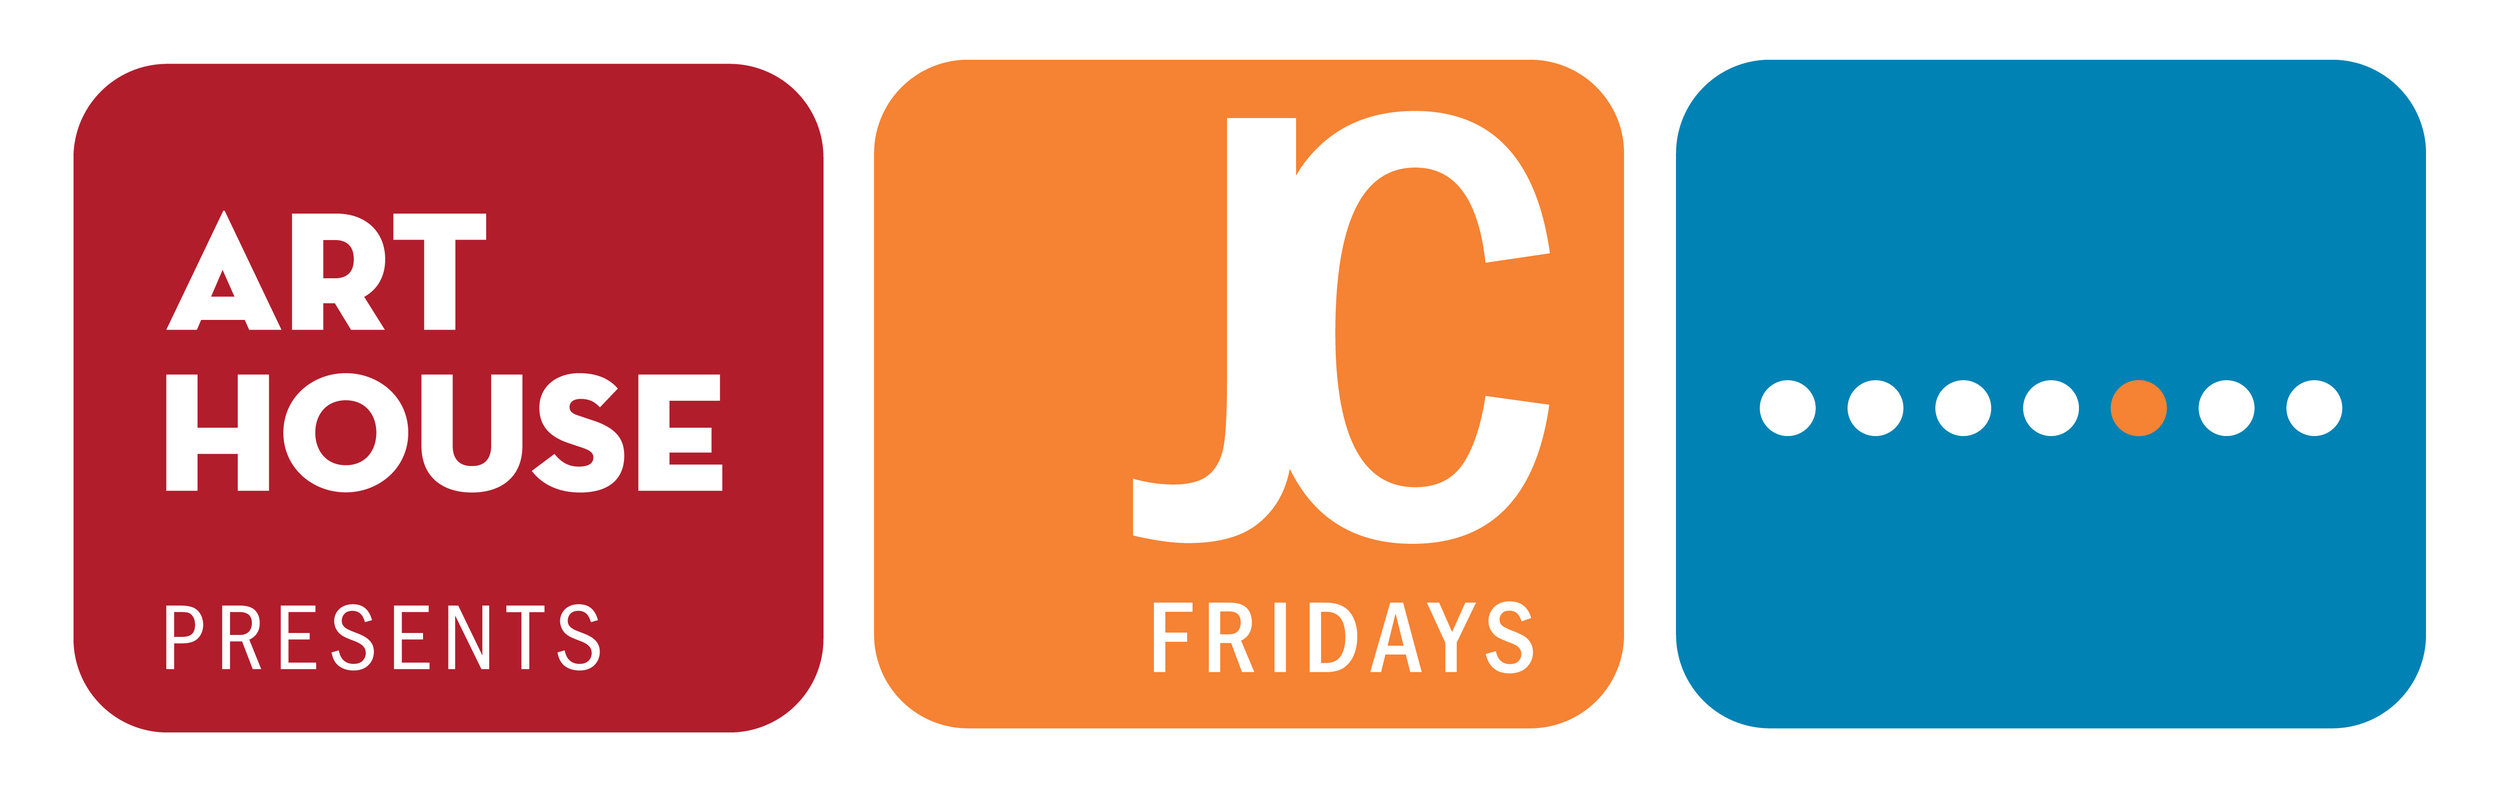 JCFRIDAY-LOGO-ARTHOUSELOCK-HORIZ2.jpg